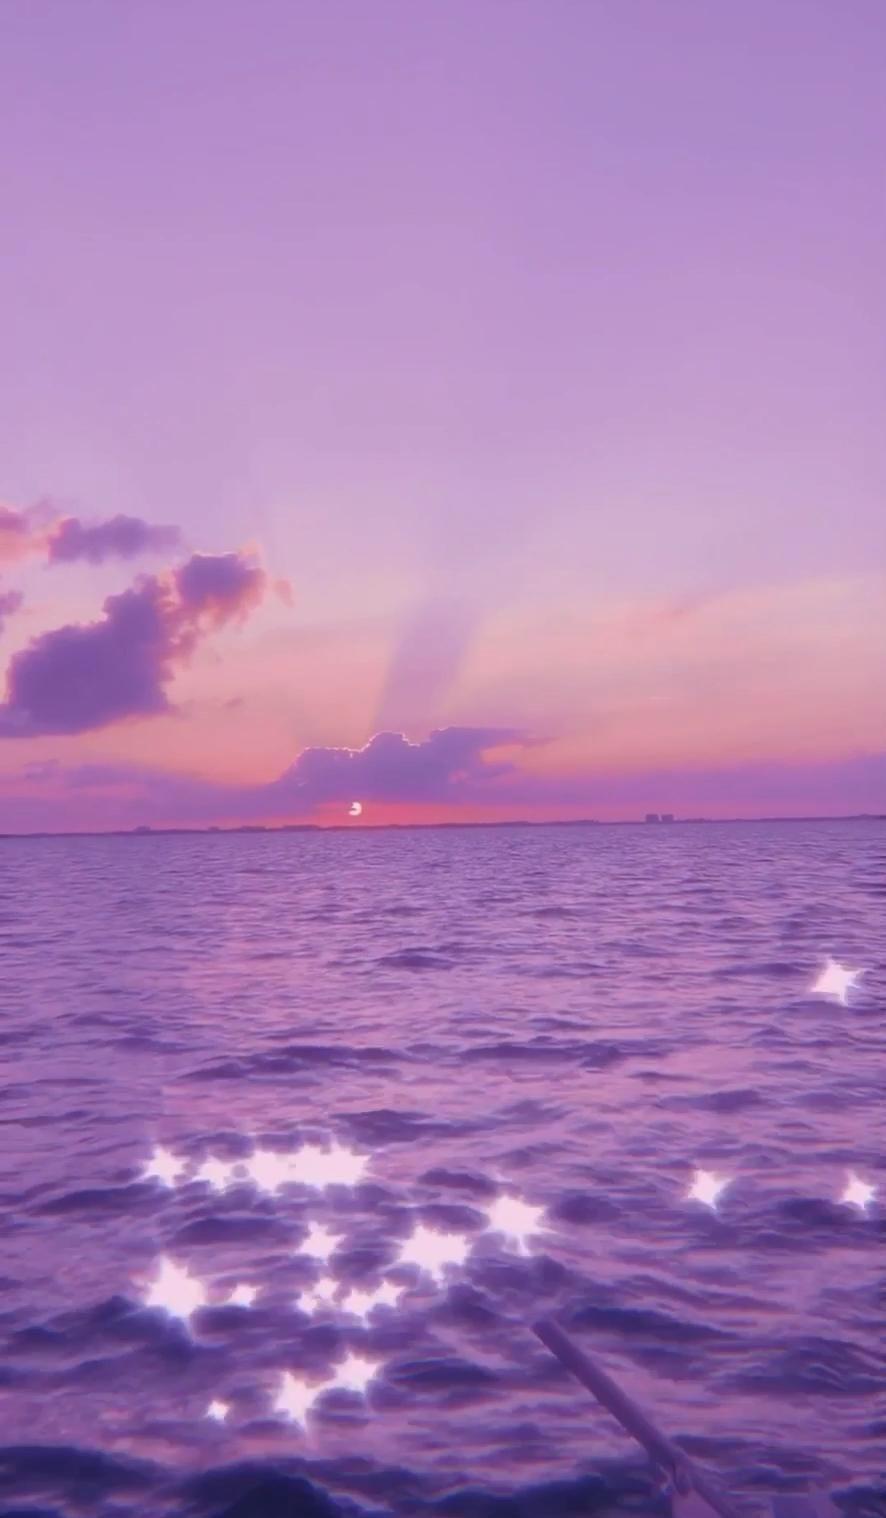 Pinterest Janiyahhross In 2020 Beautiful Landscape Wallpaper Iphone Wallpaper Sky Purple Wallpaper Iphone